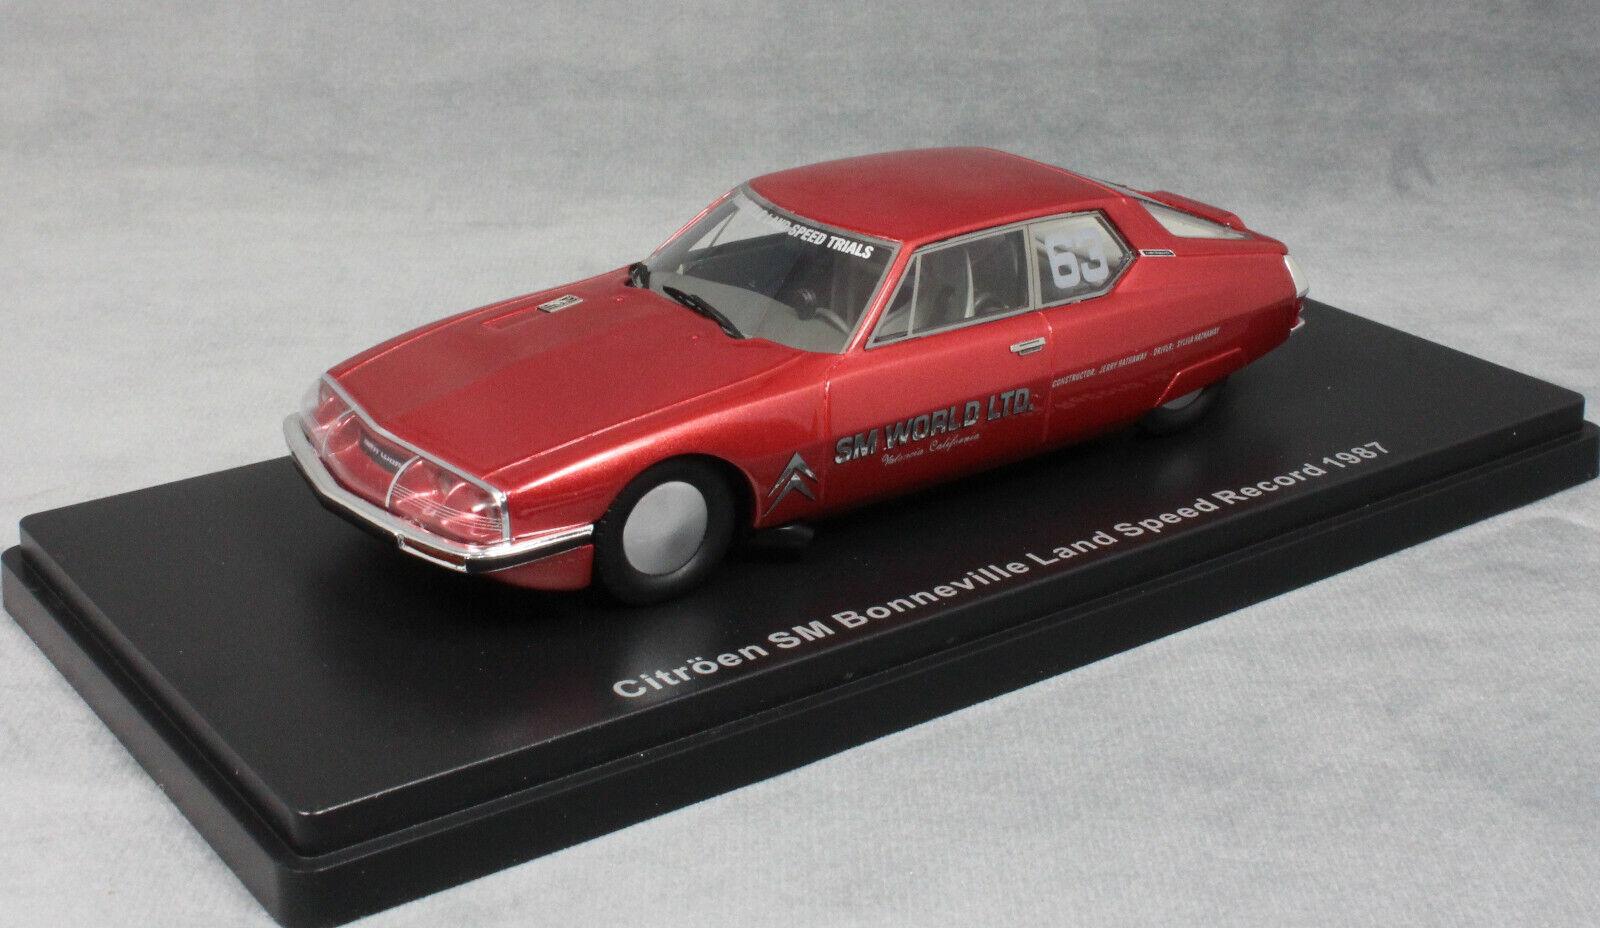 Neo Models Citroen SM Bonneville Land Speed Record 1987 202mph 46605 1 43 NEW